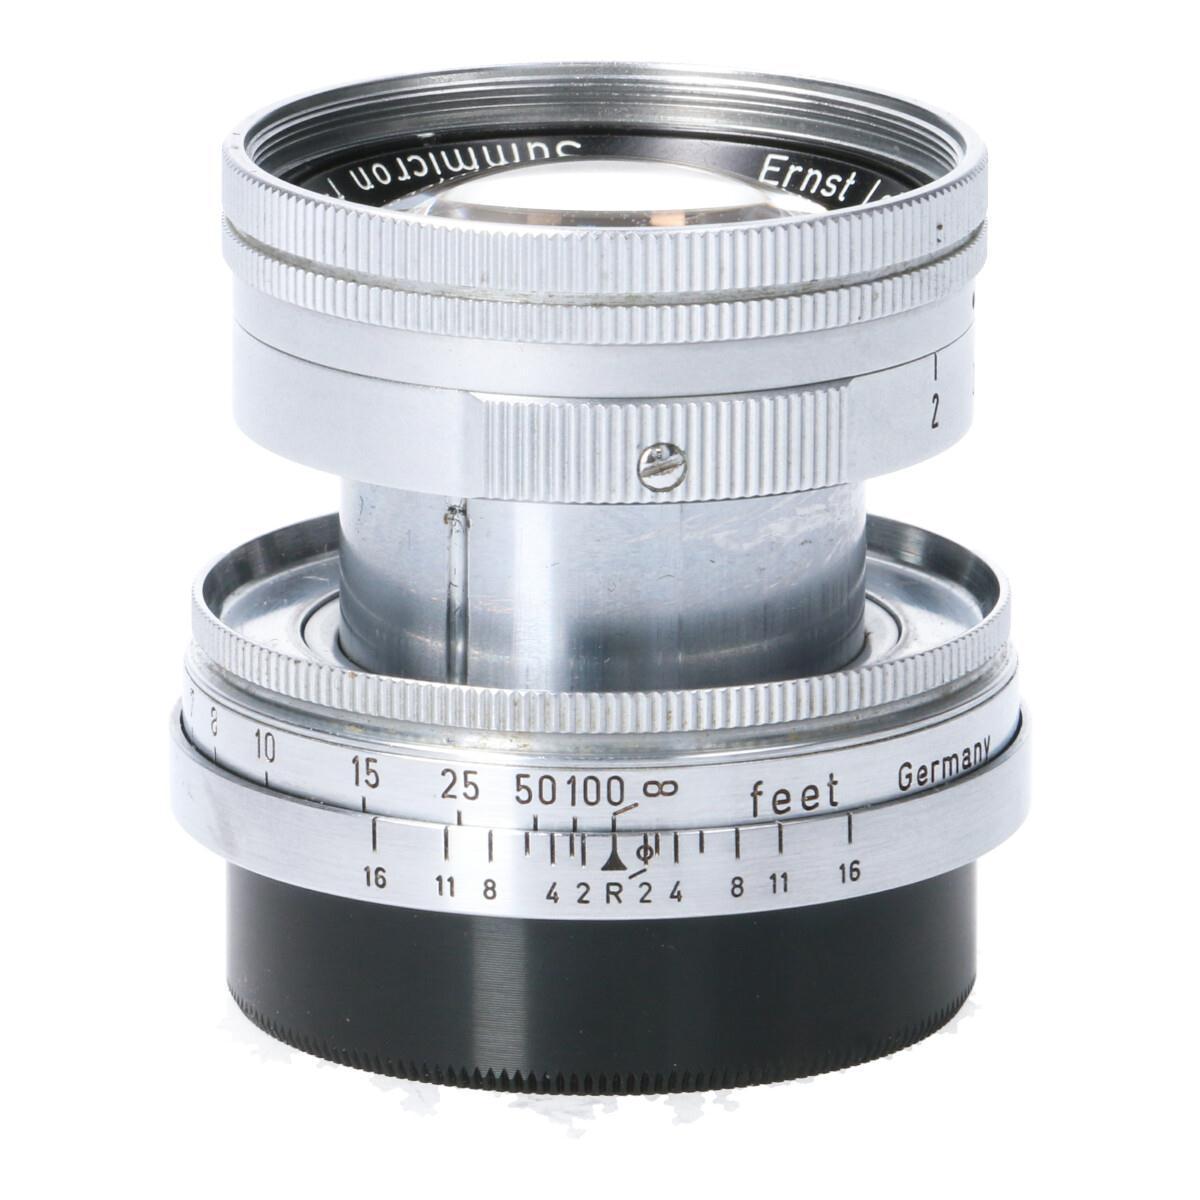 LEICA SUMMICRON-L50mm F2沈胴【中古】